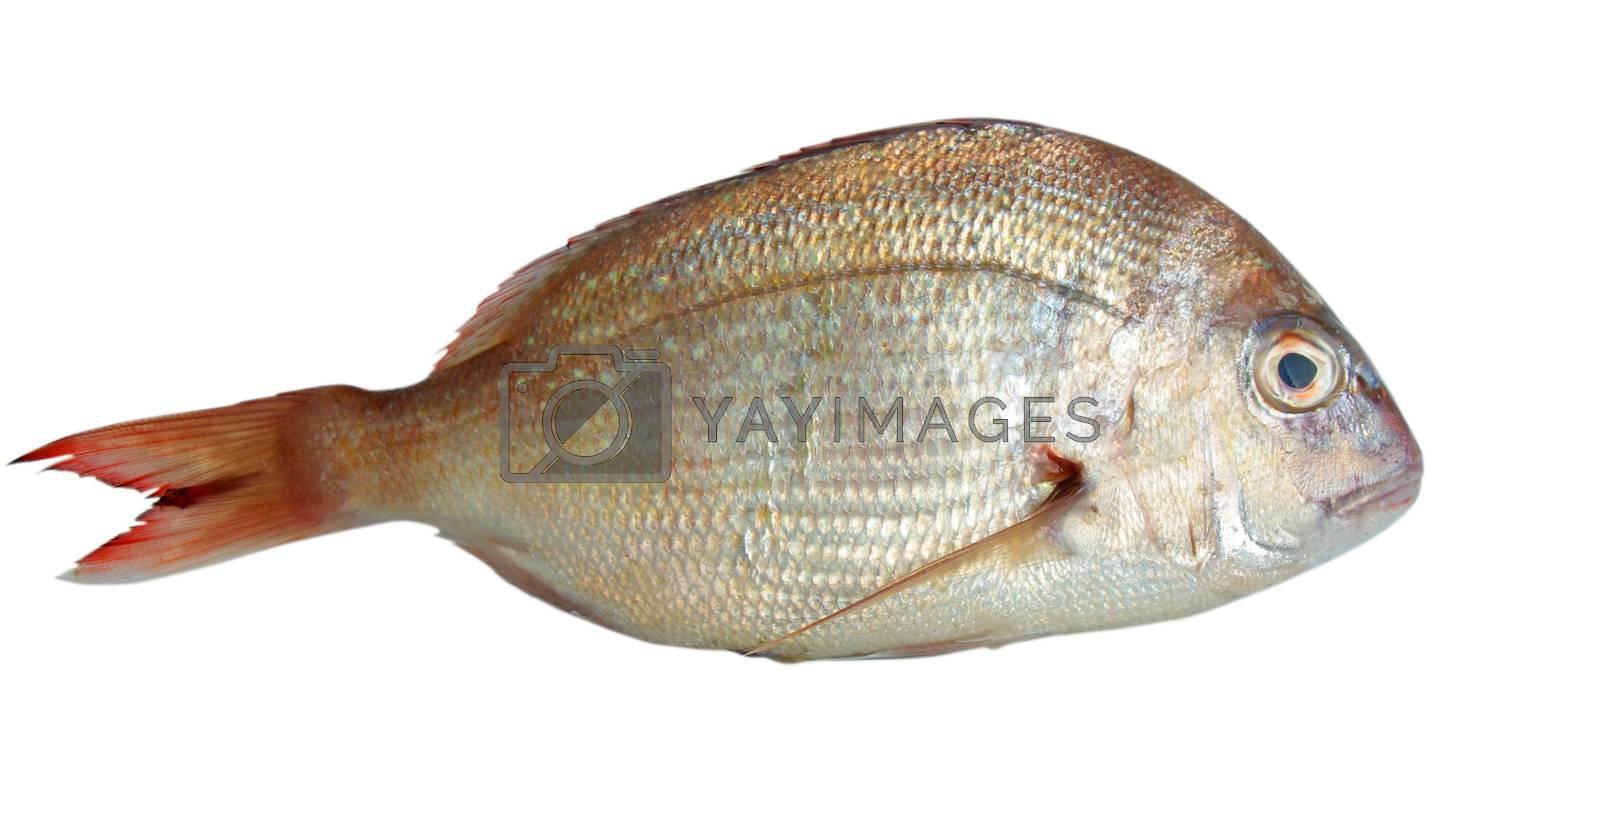 fish closeup over white background